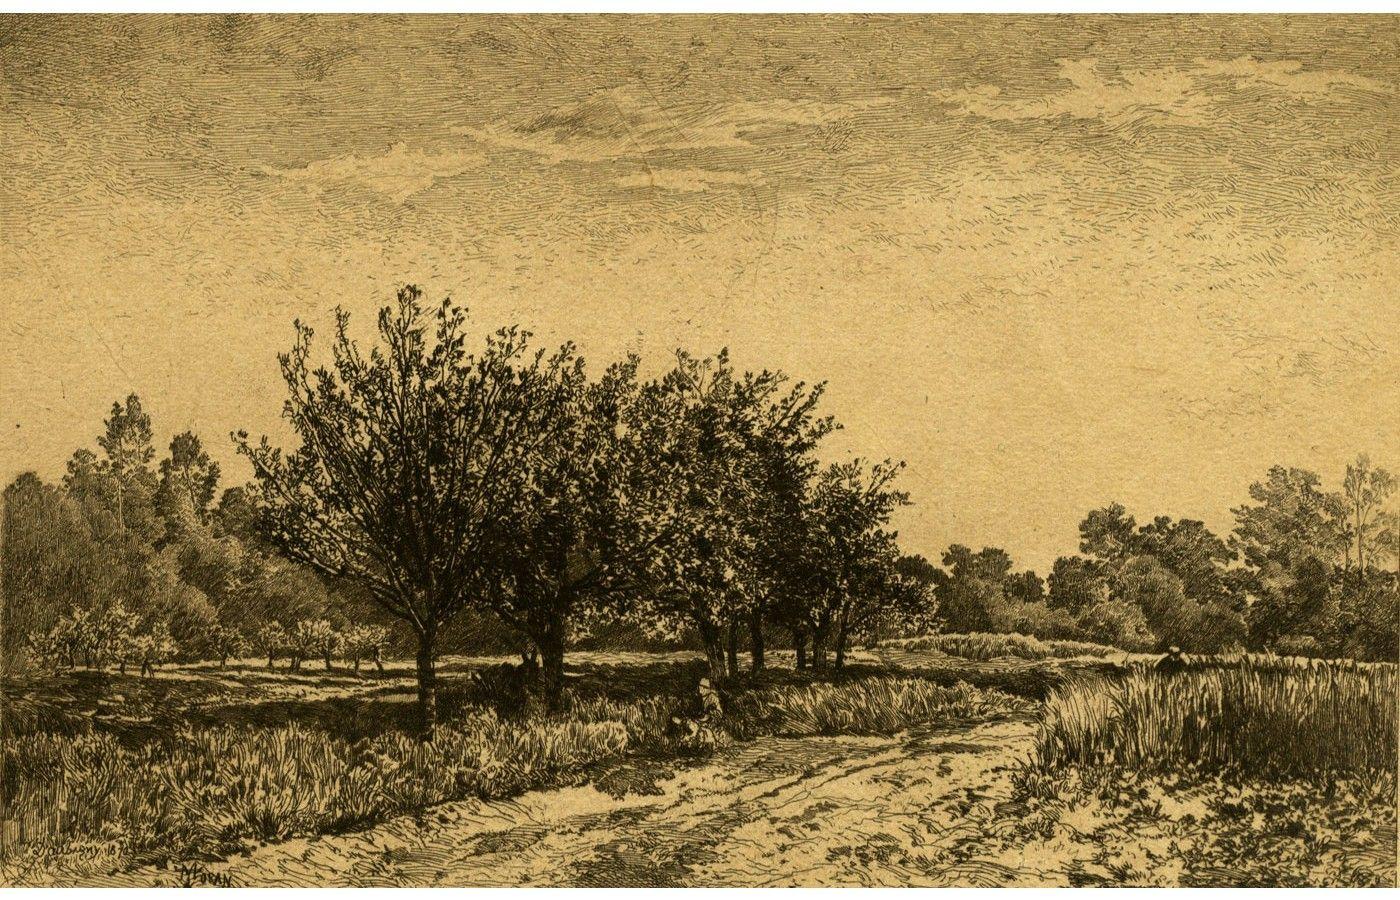 Charles-François Daubigny - 1870 Etching, Figures Under Trees in a Landscape - Sulis Fine Art